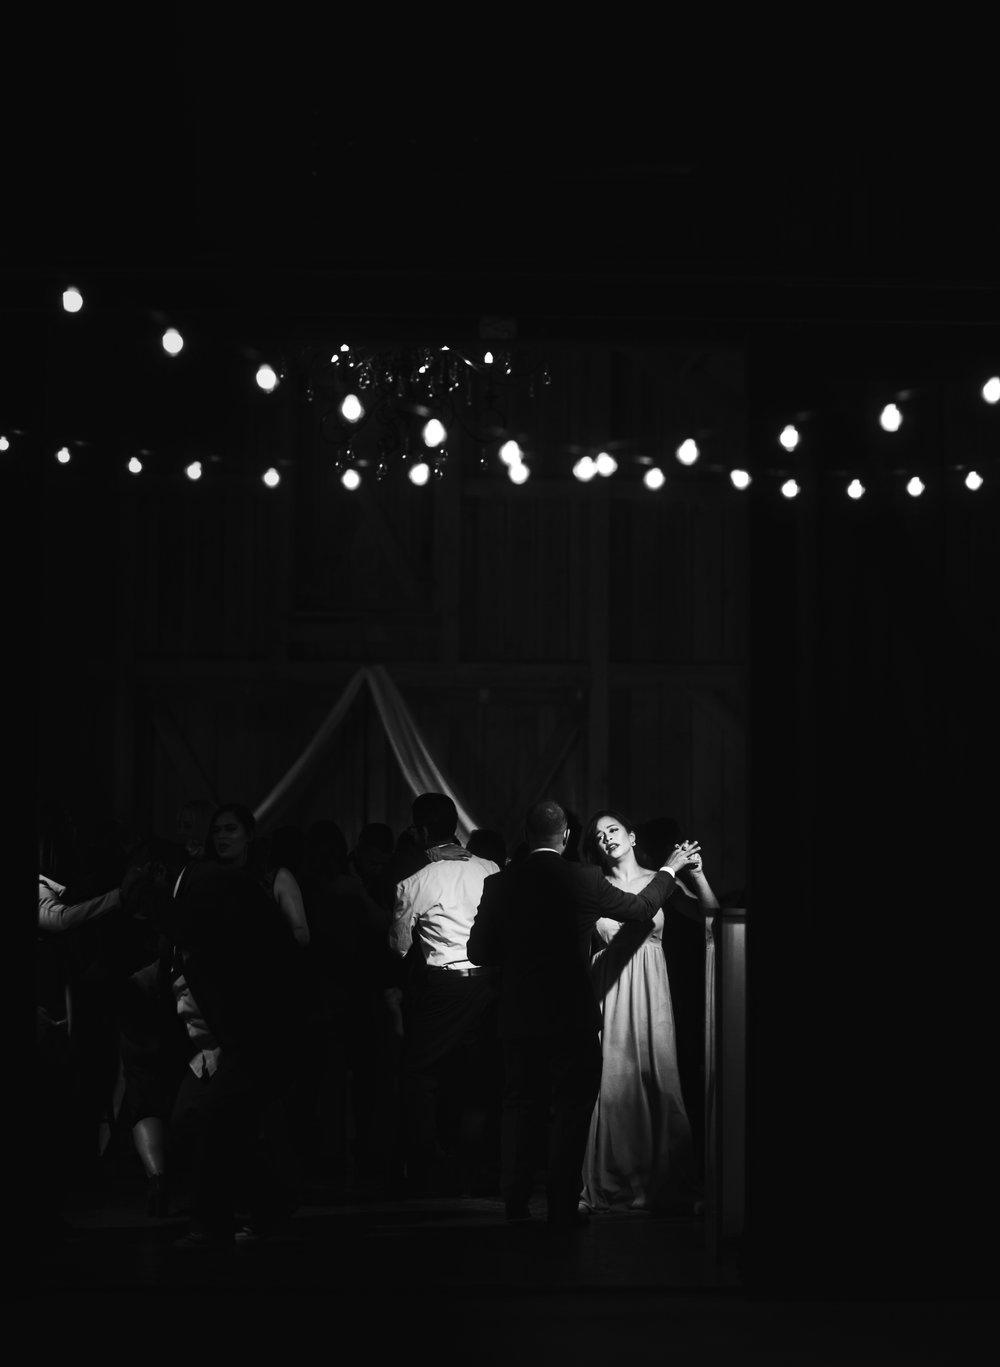 Wedding Day | Bridle Oaks Barn | Vanessa Boy Photography | vanessaboy.com-812.com final gallery.jpg